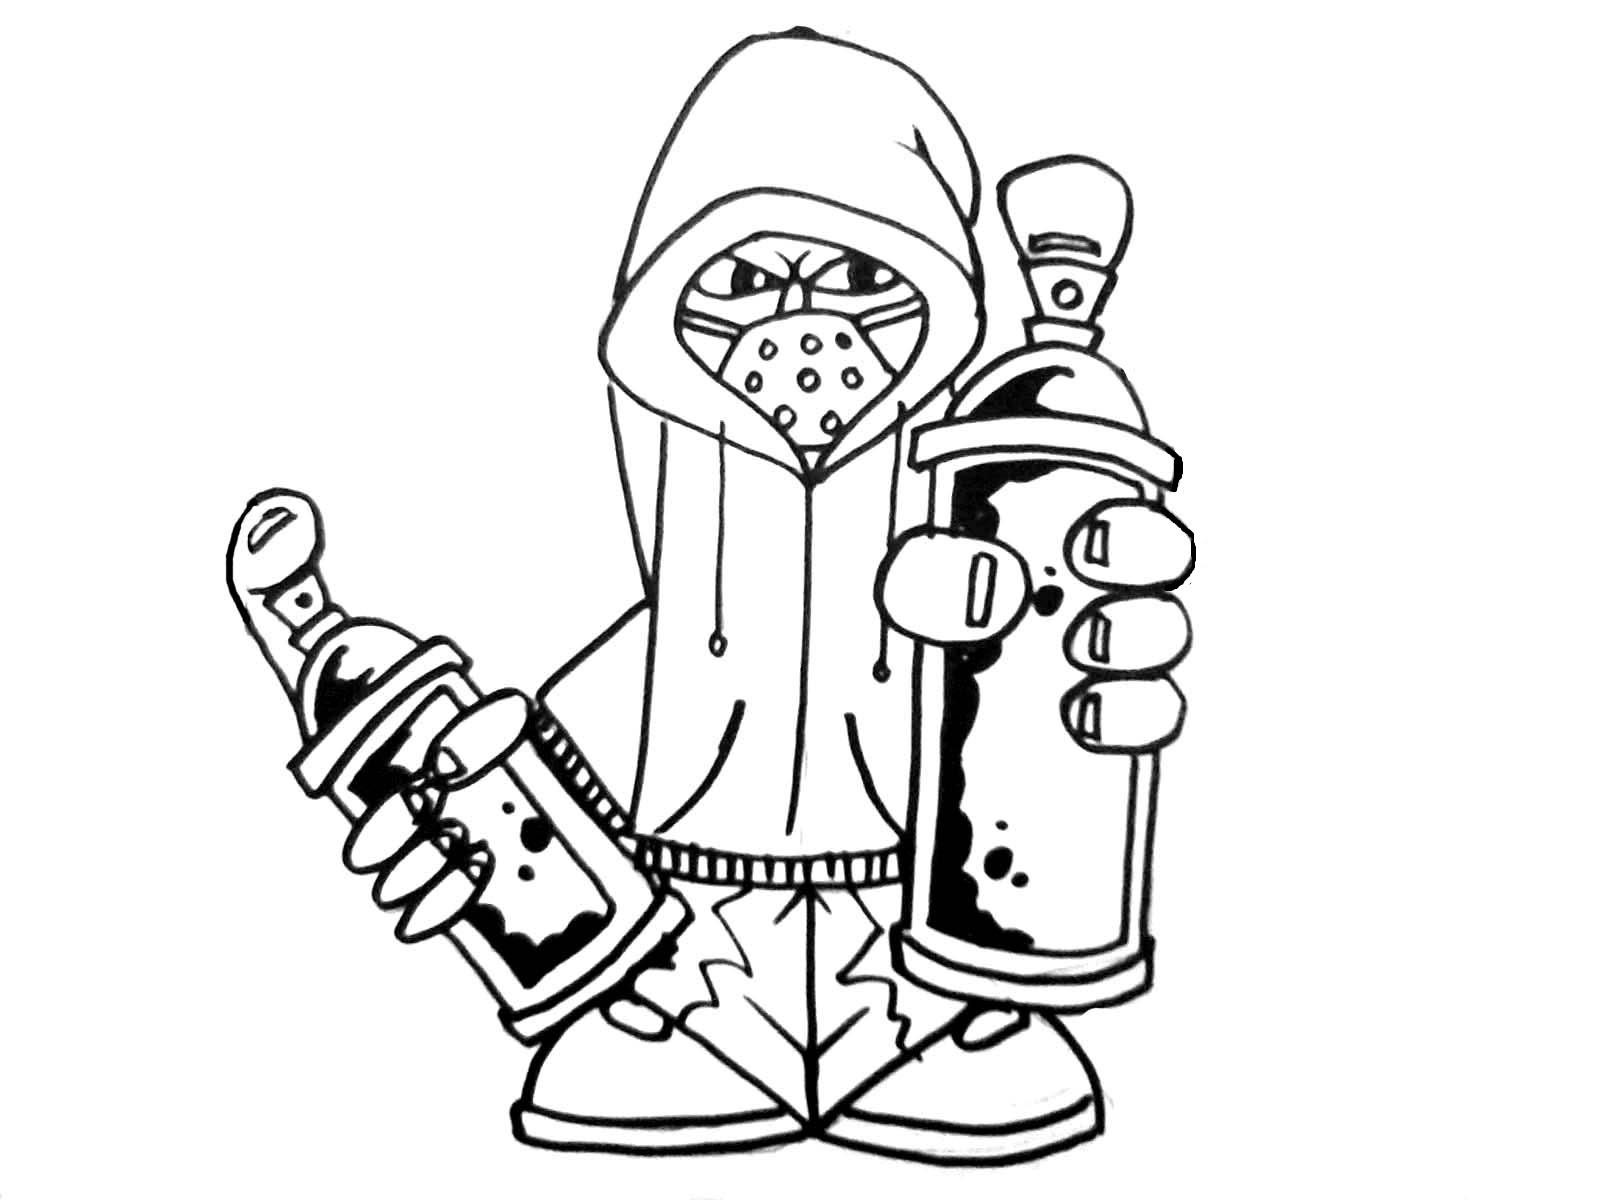 gangster cartoons drawing at getdrawings com free for personal use rh getdrawings com gangster cartoon character drawings Cool Cartoon Drawings